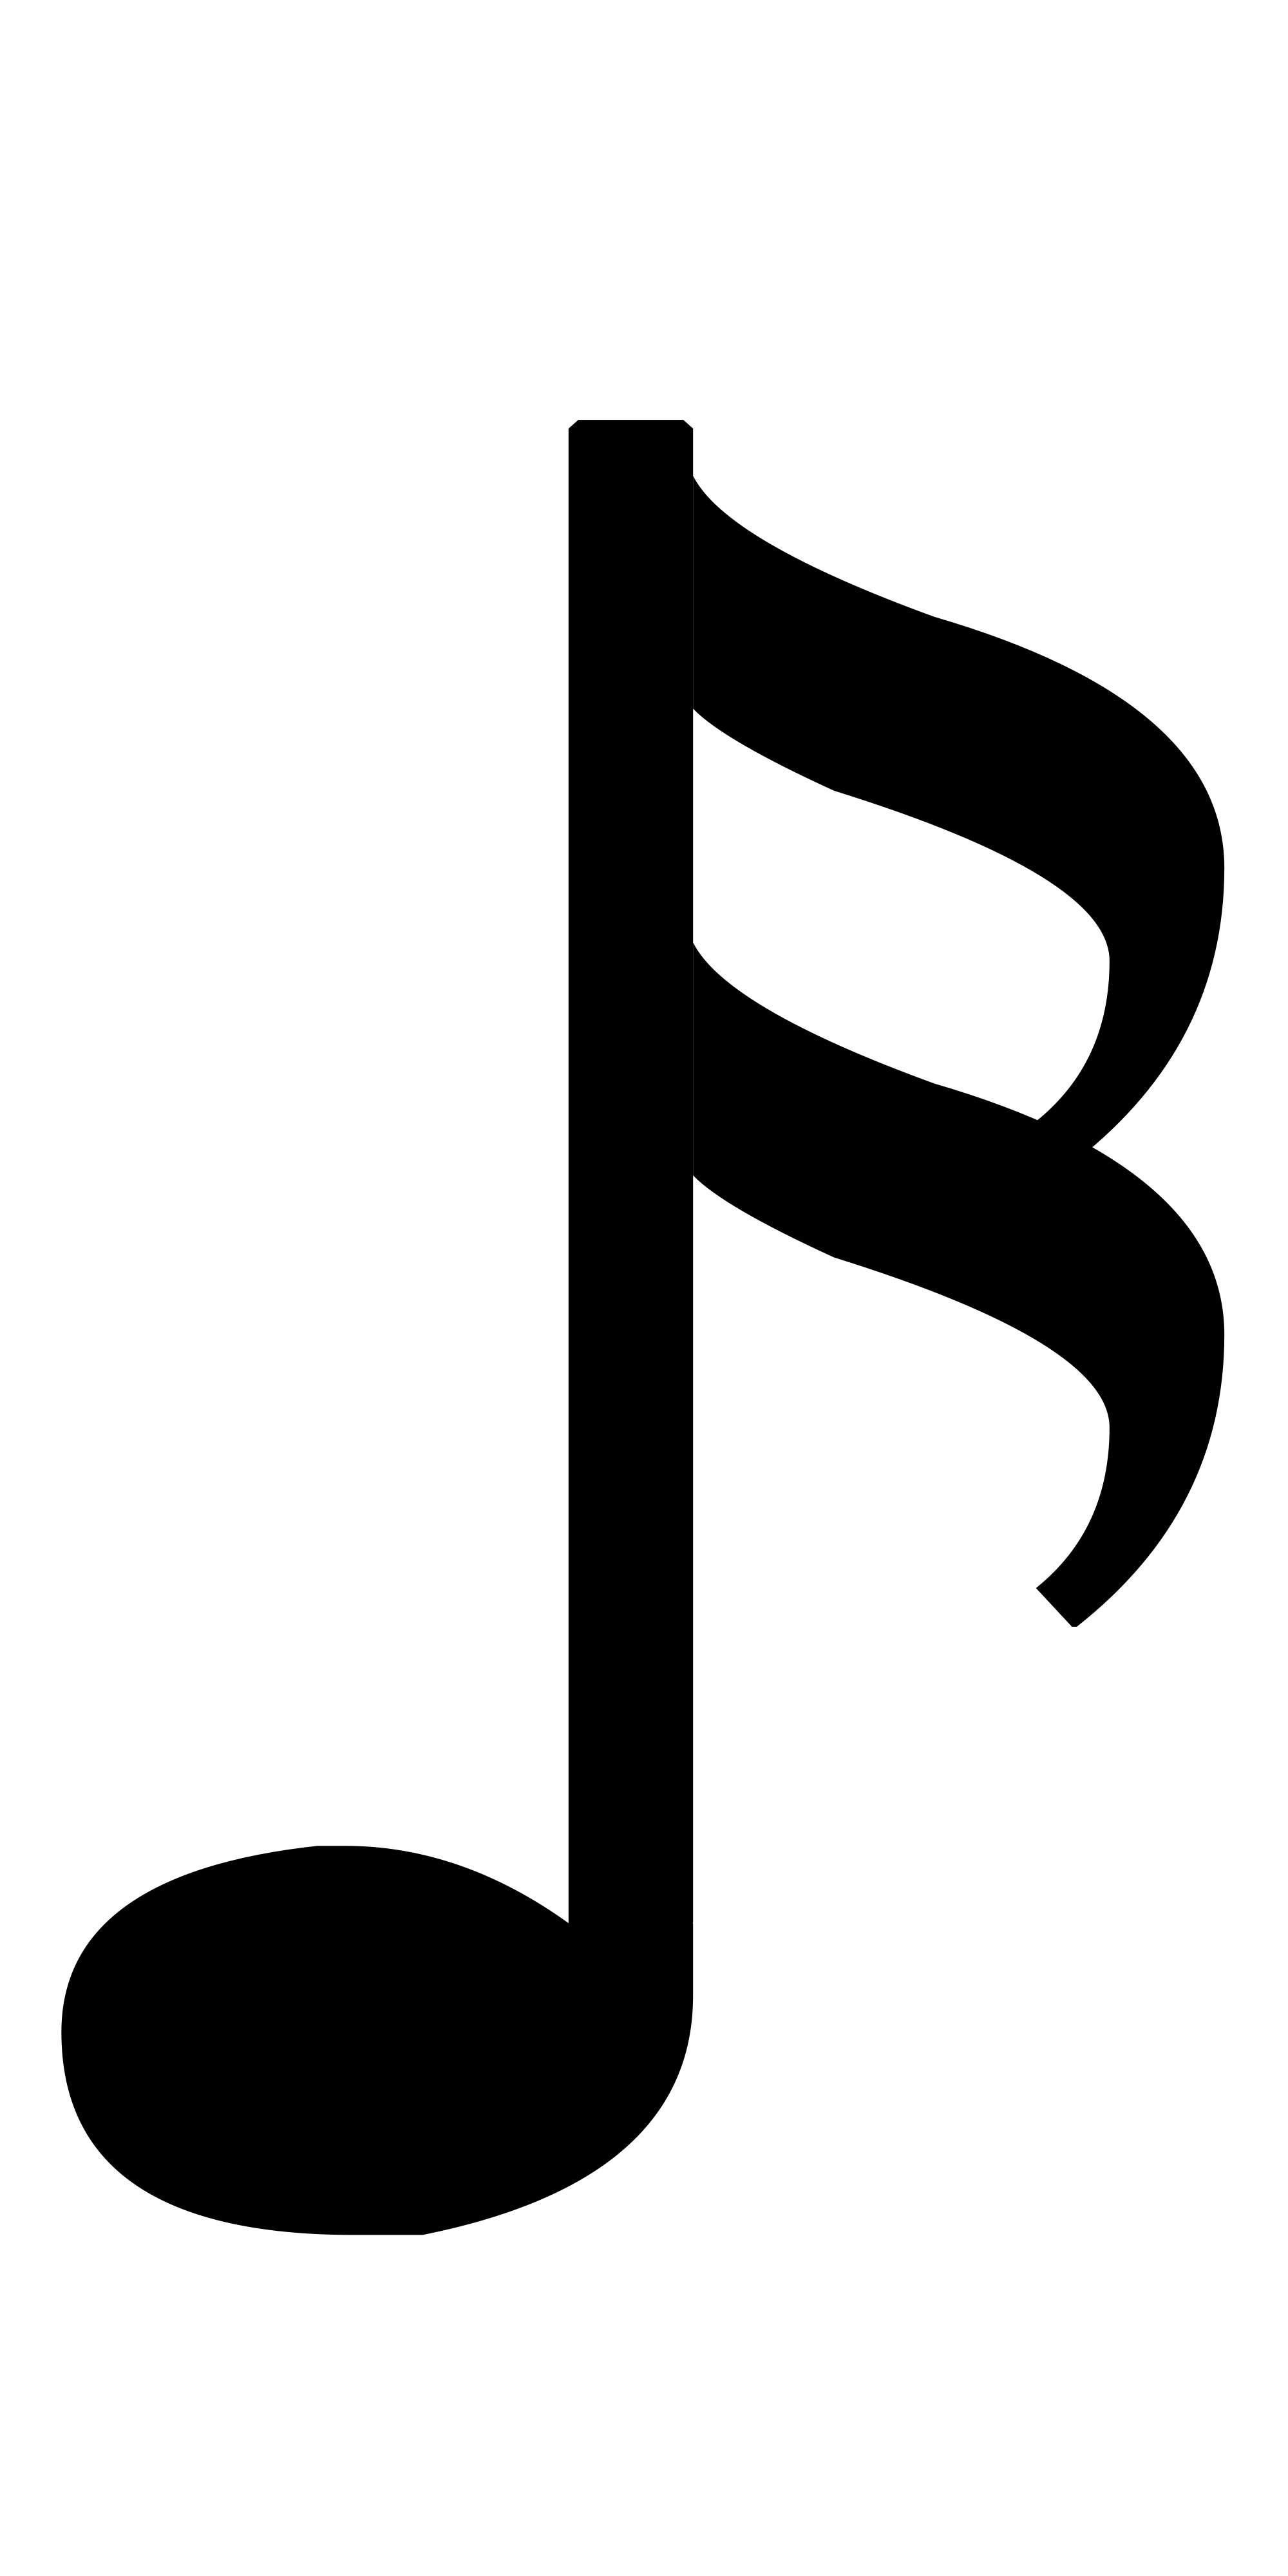 2000px-1-16_note_semiquaver_(music).svg.png